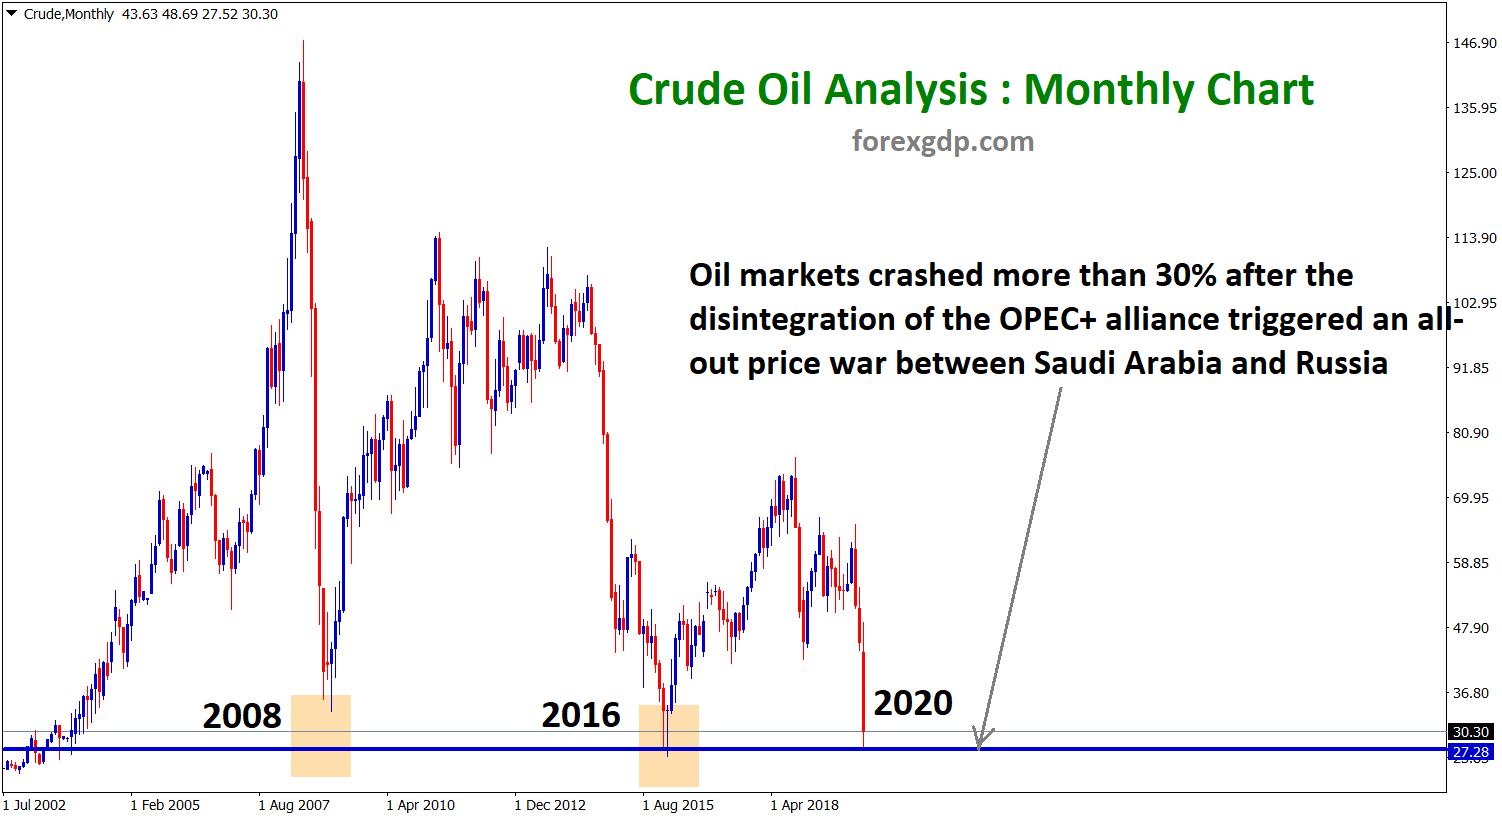 Crude oil wti usd price hits the bottom